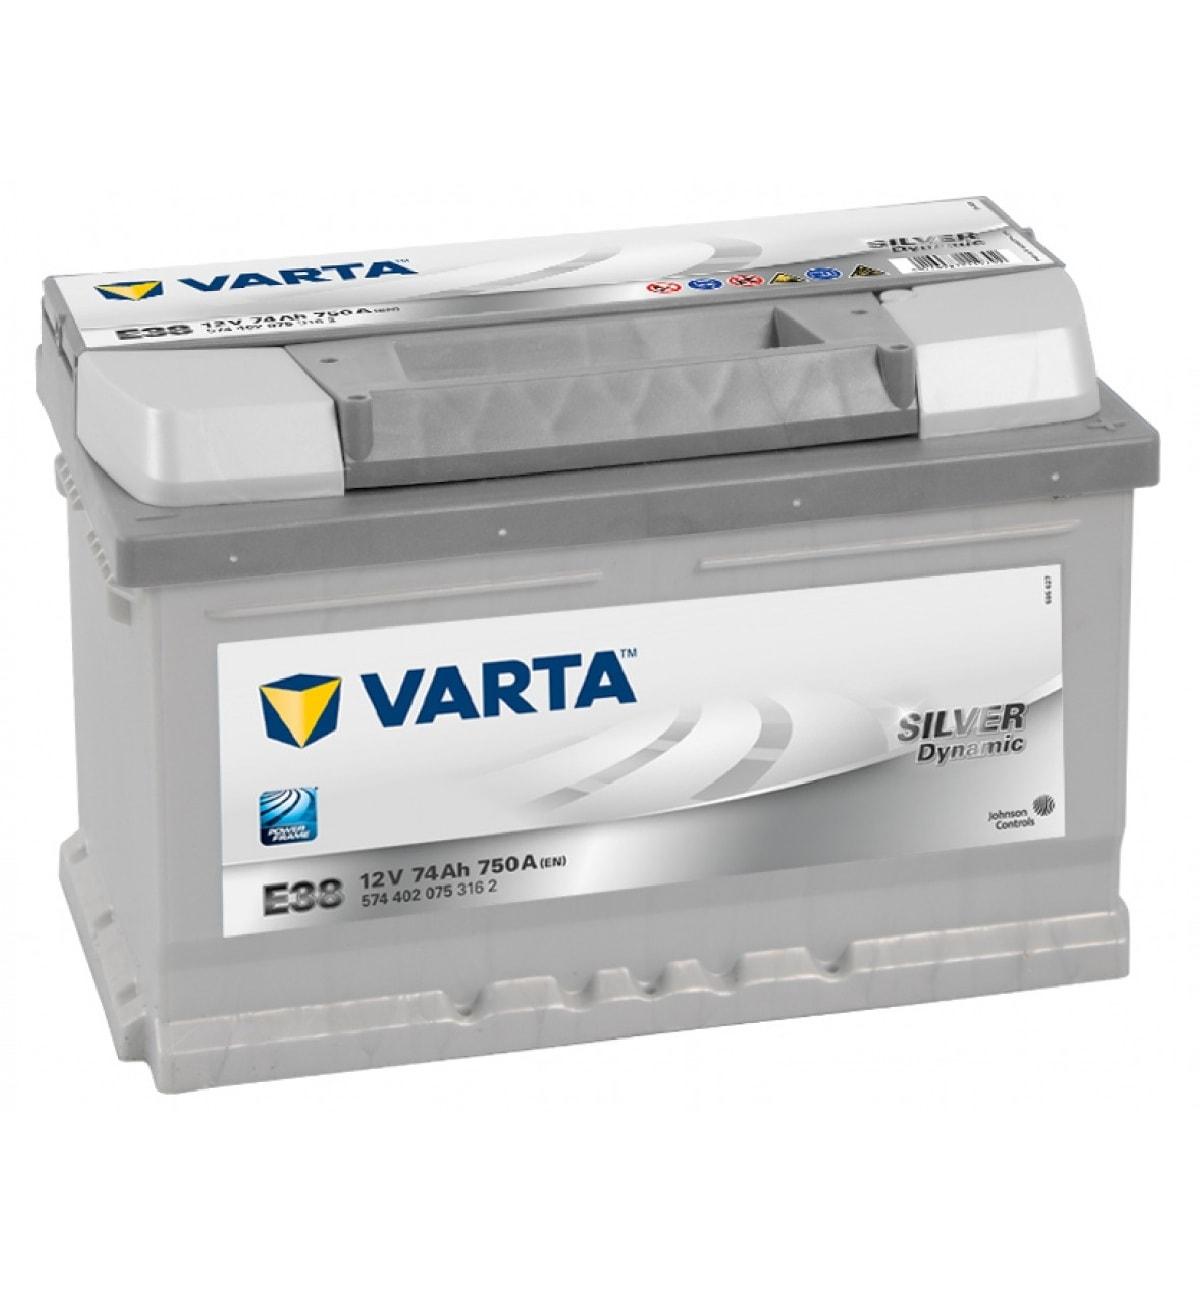 Купить Аккумулятор Varta 74 Ah Silver Dynamic (0) 750A (E38)